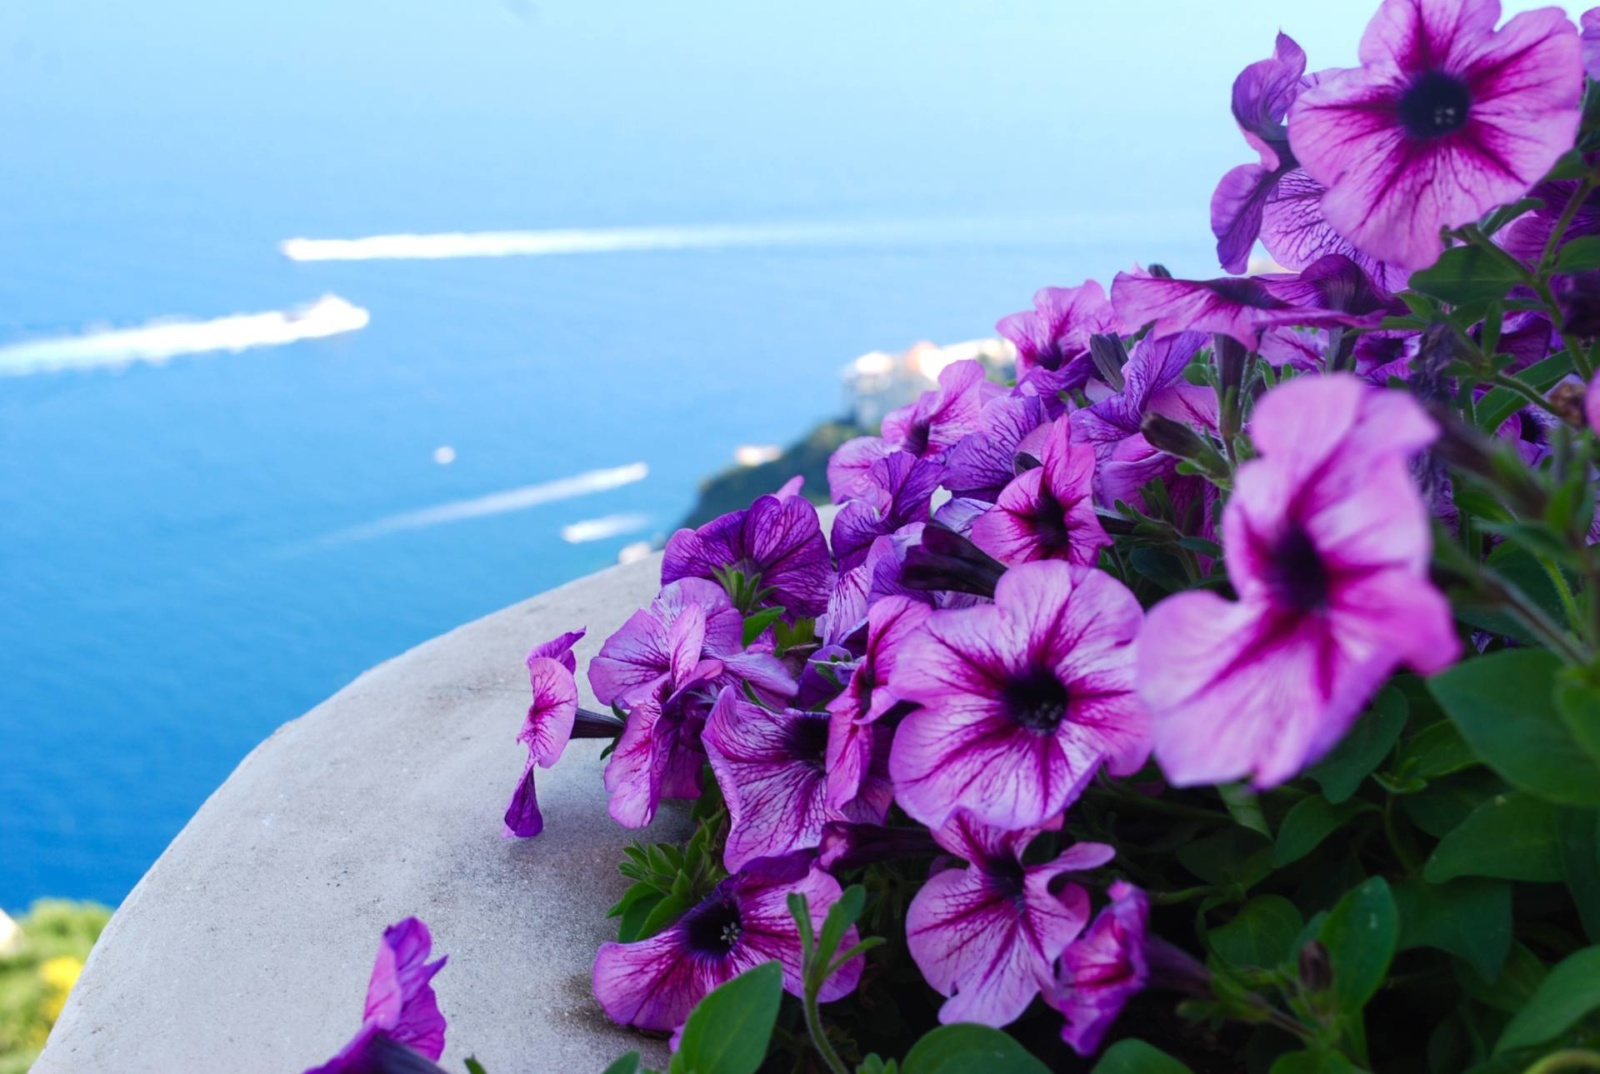 monastero-santa-rosa-amalfi-review7